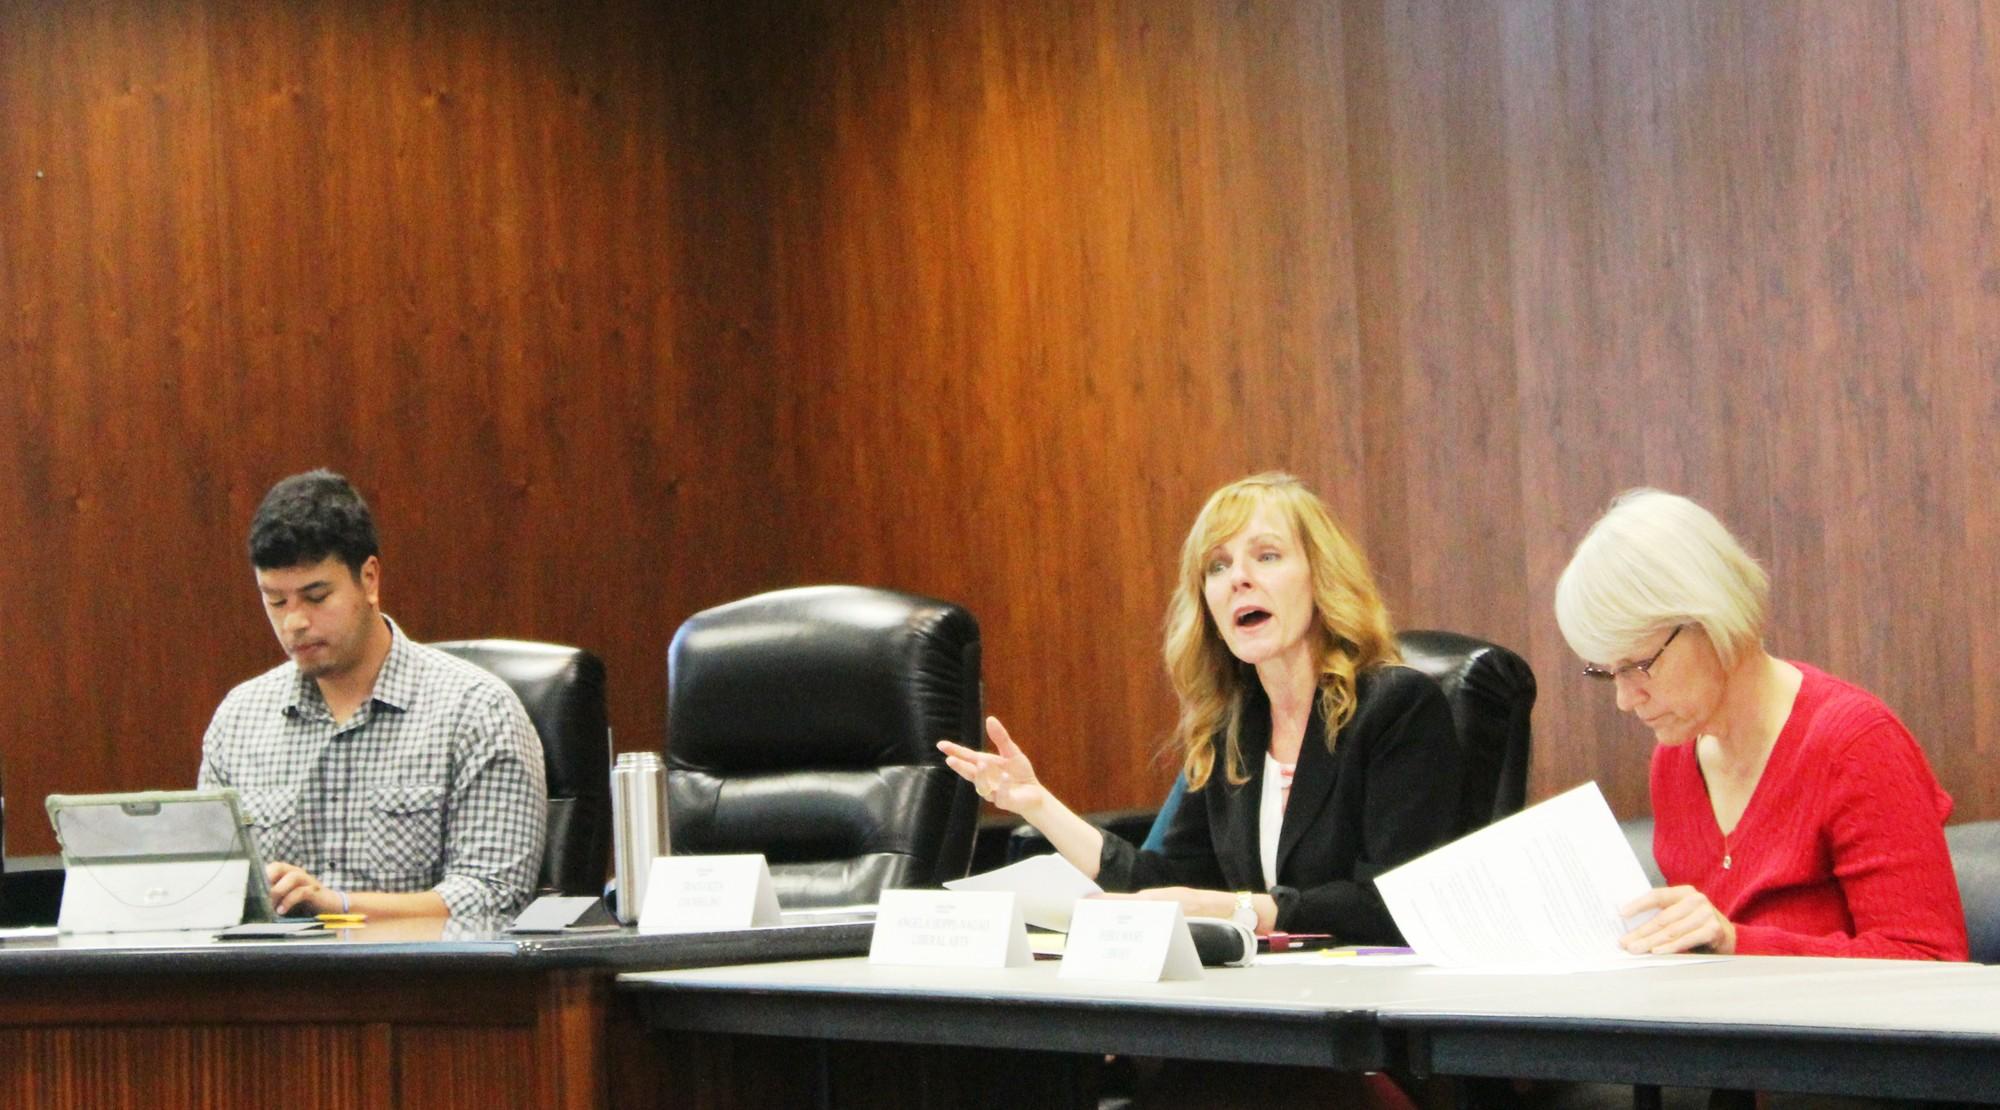 Faculty discuss hiring priorities